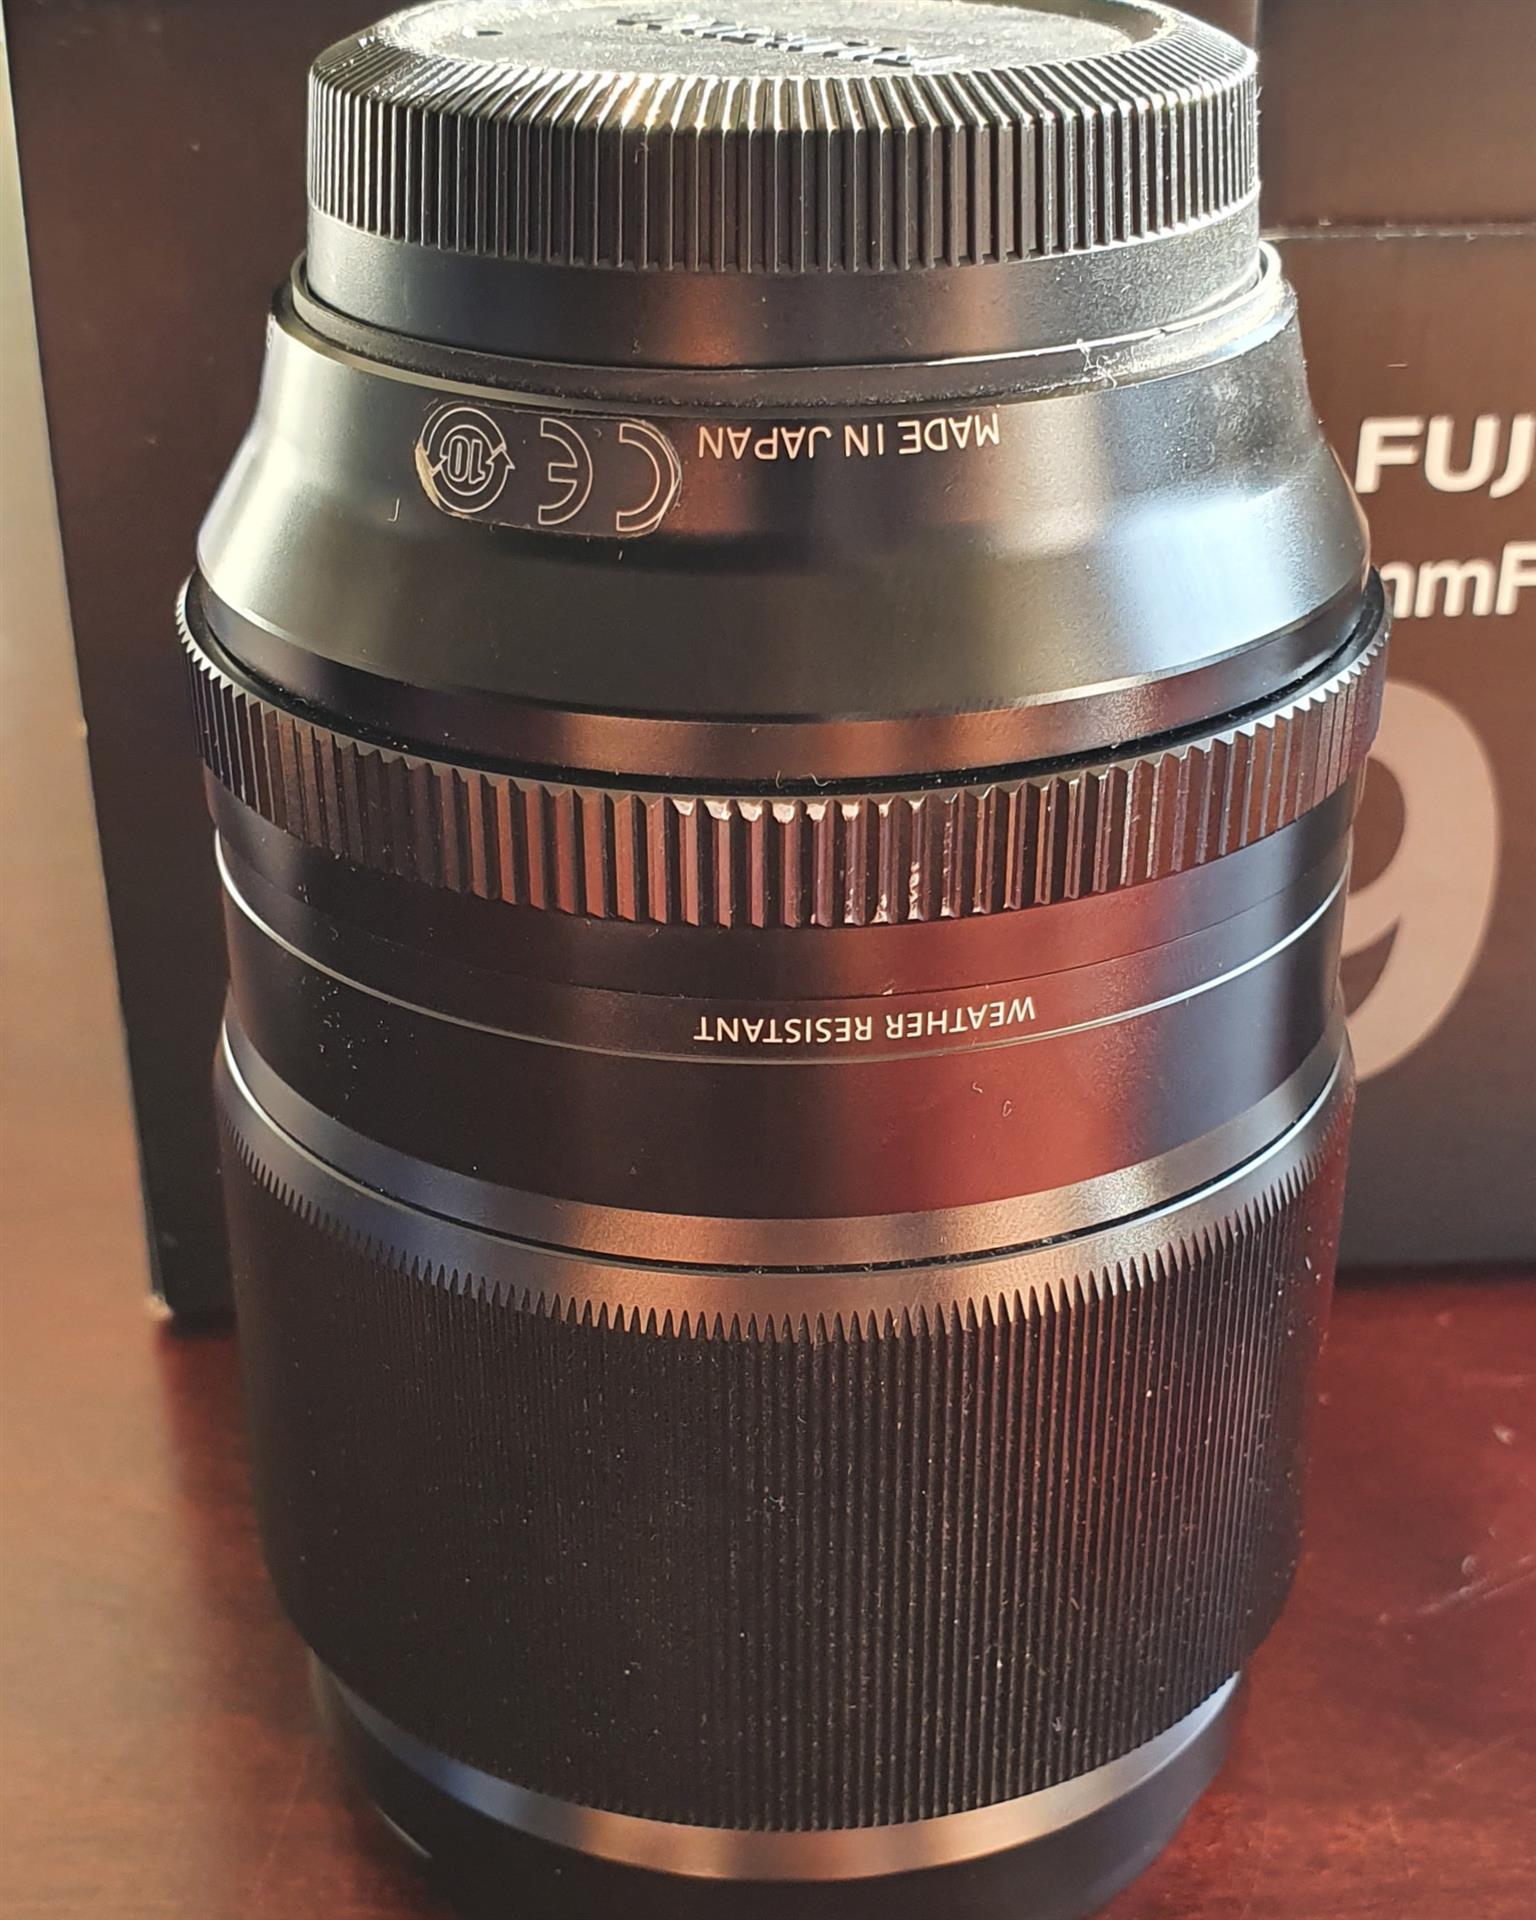 Fujifilm 90mm F2